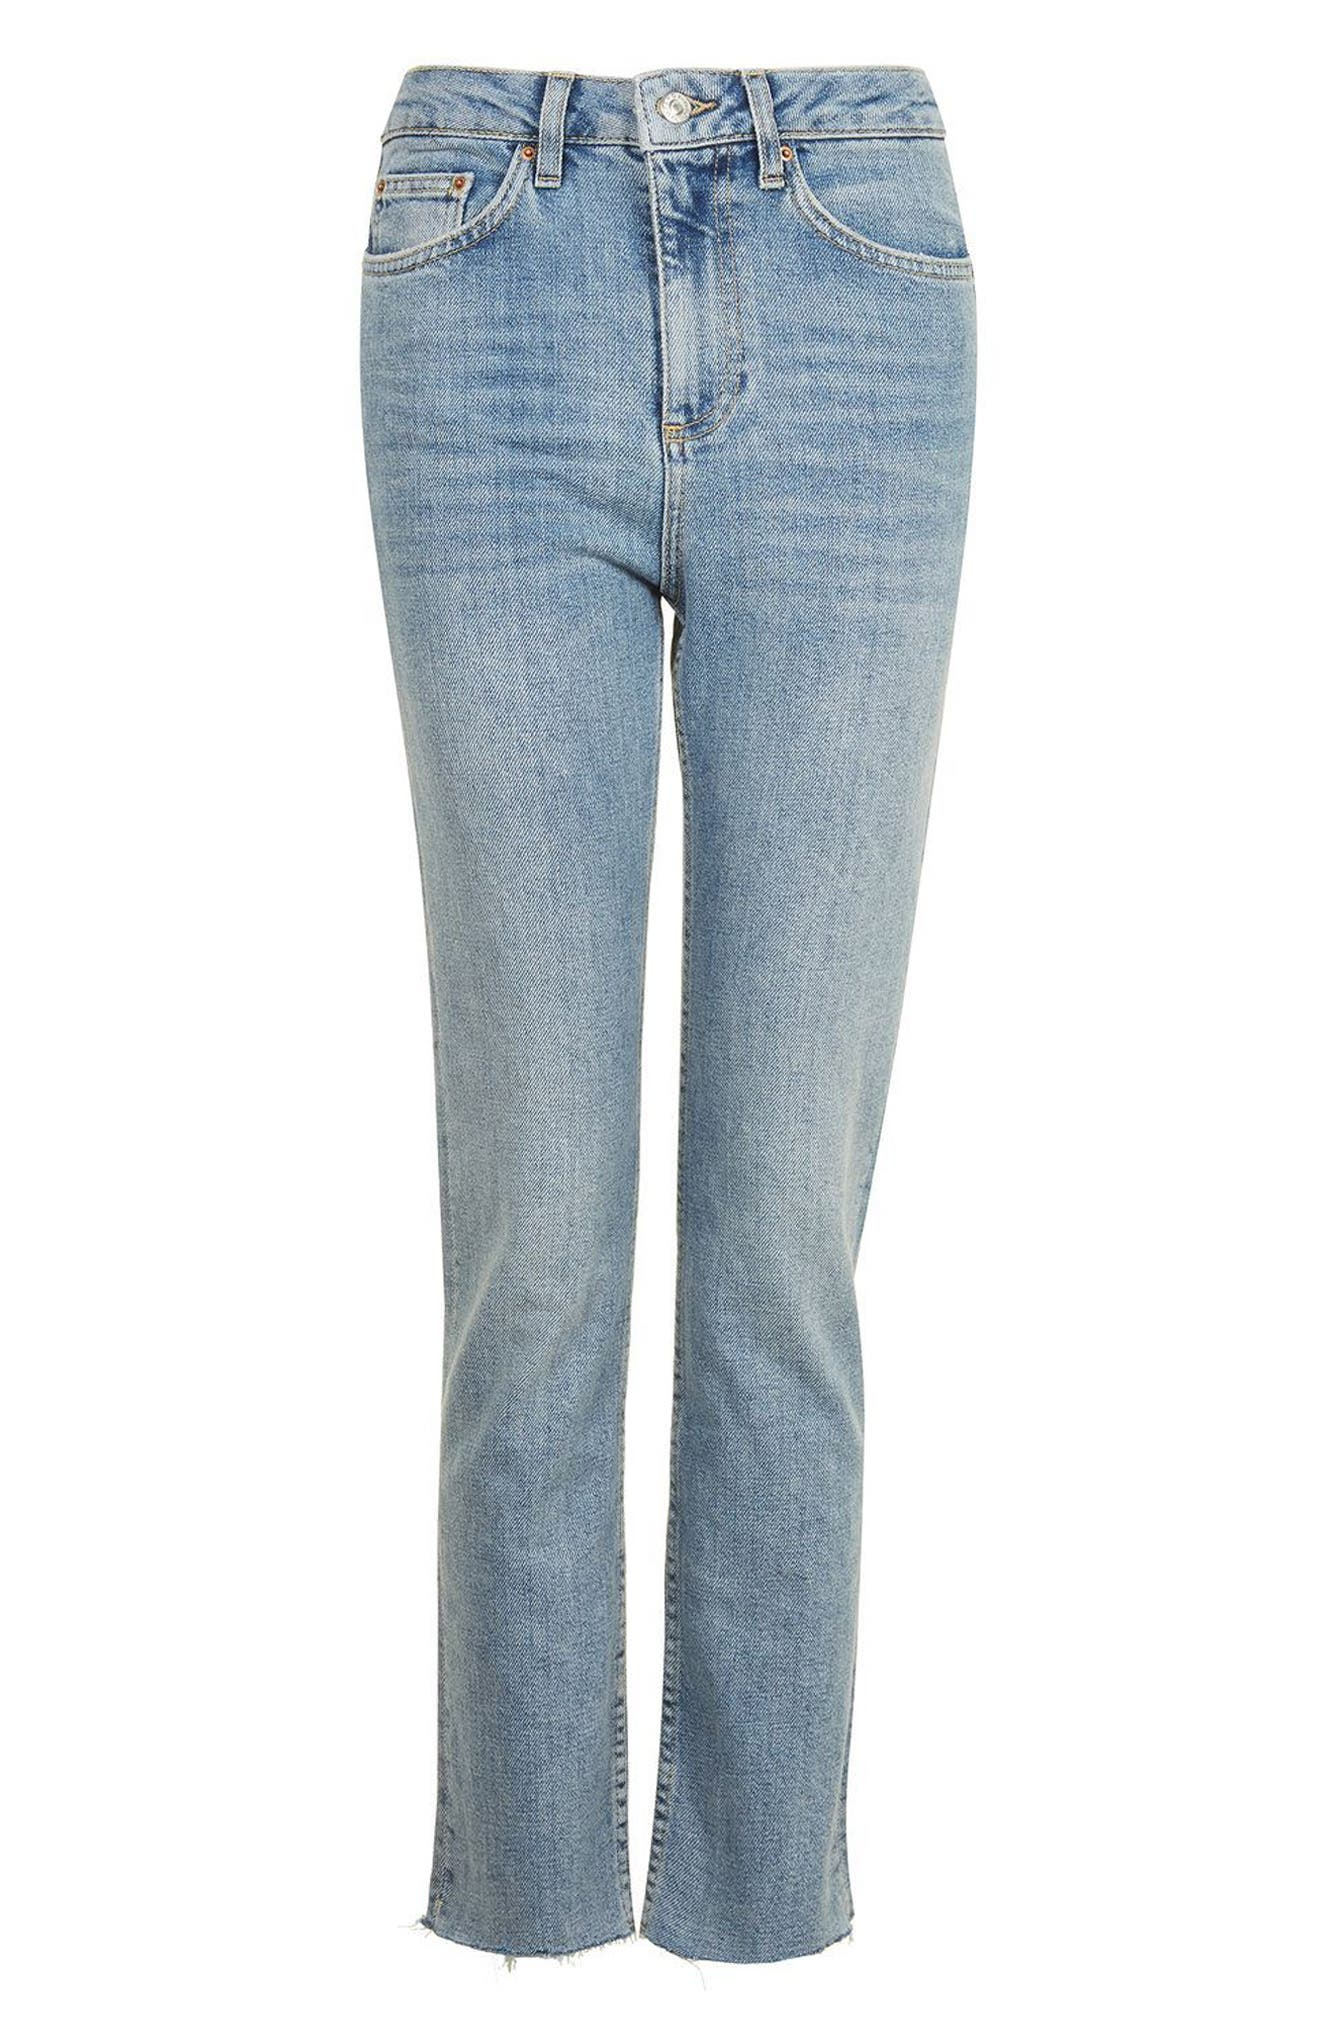 TOPSHOP, Moto Raw Hem Straight Leg Jeans, Alternate thumbnail 4, color, 420